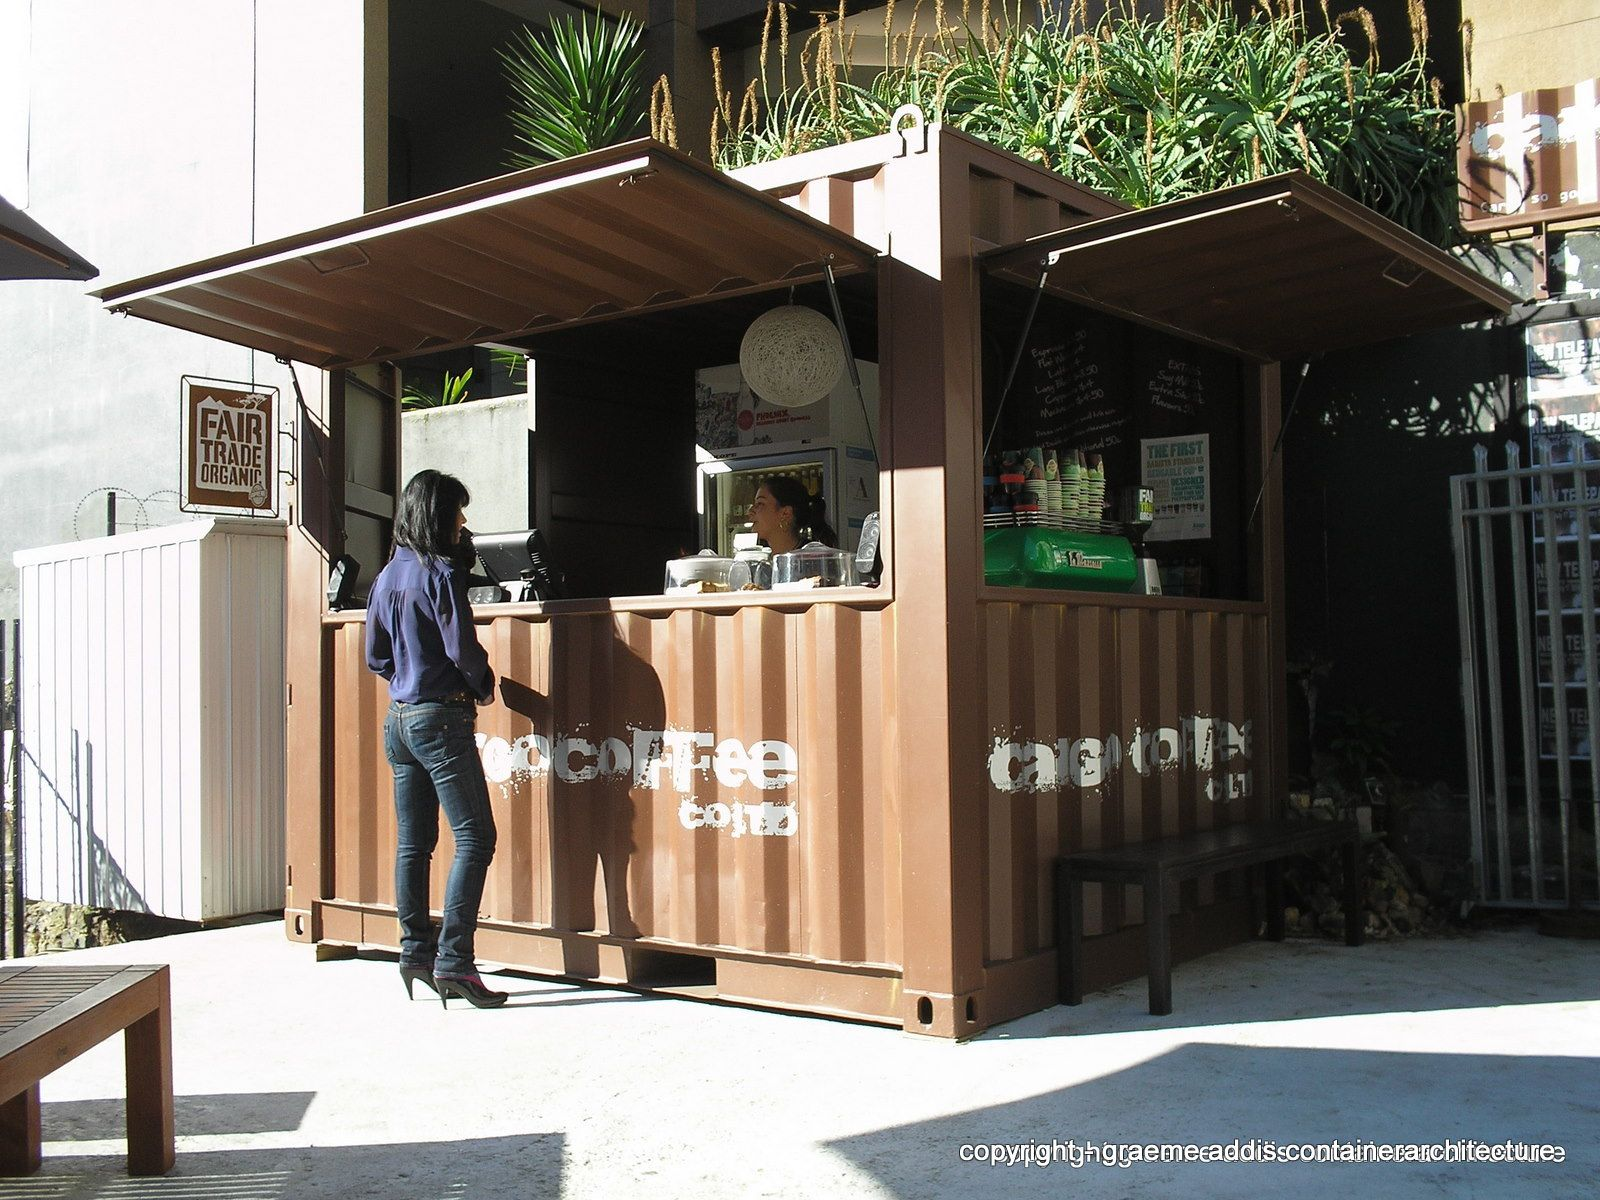 Container Cafe Google Search Cafe Container Cafeterias Projeto Da Galpao Do Container